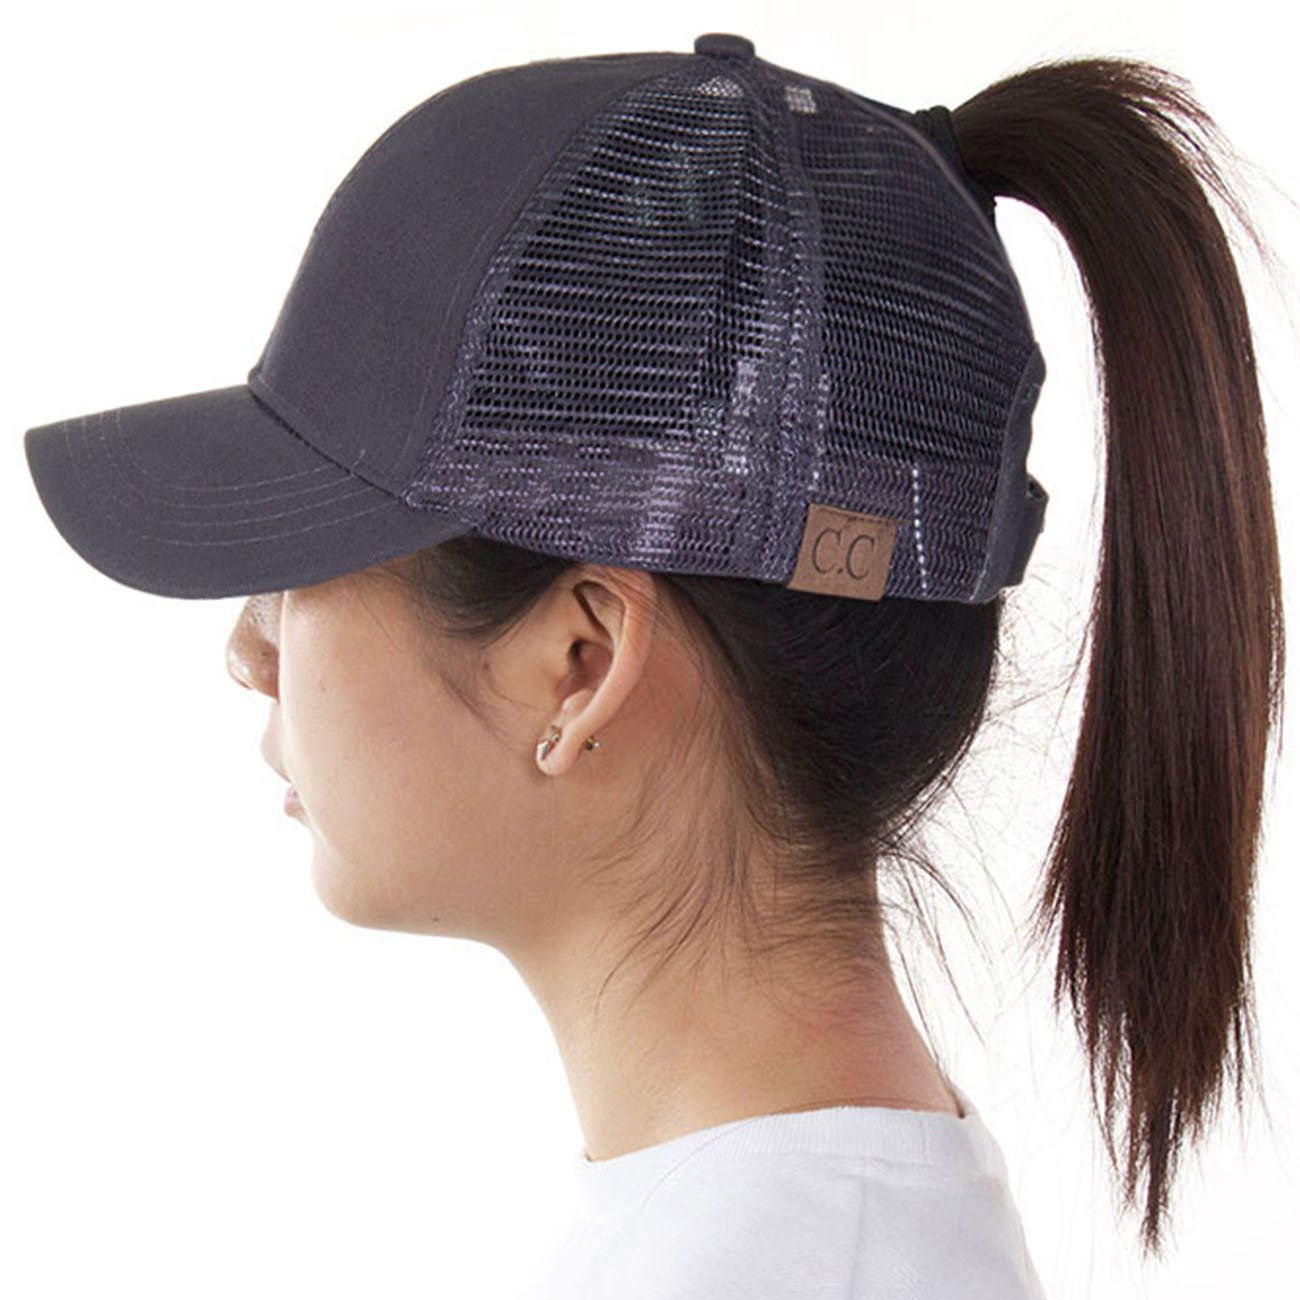 ScarvesMe C.C Exclusive Mesh Ponytail Messy Bun Ponycap Baseball Cap (Charcoal)